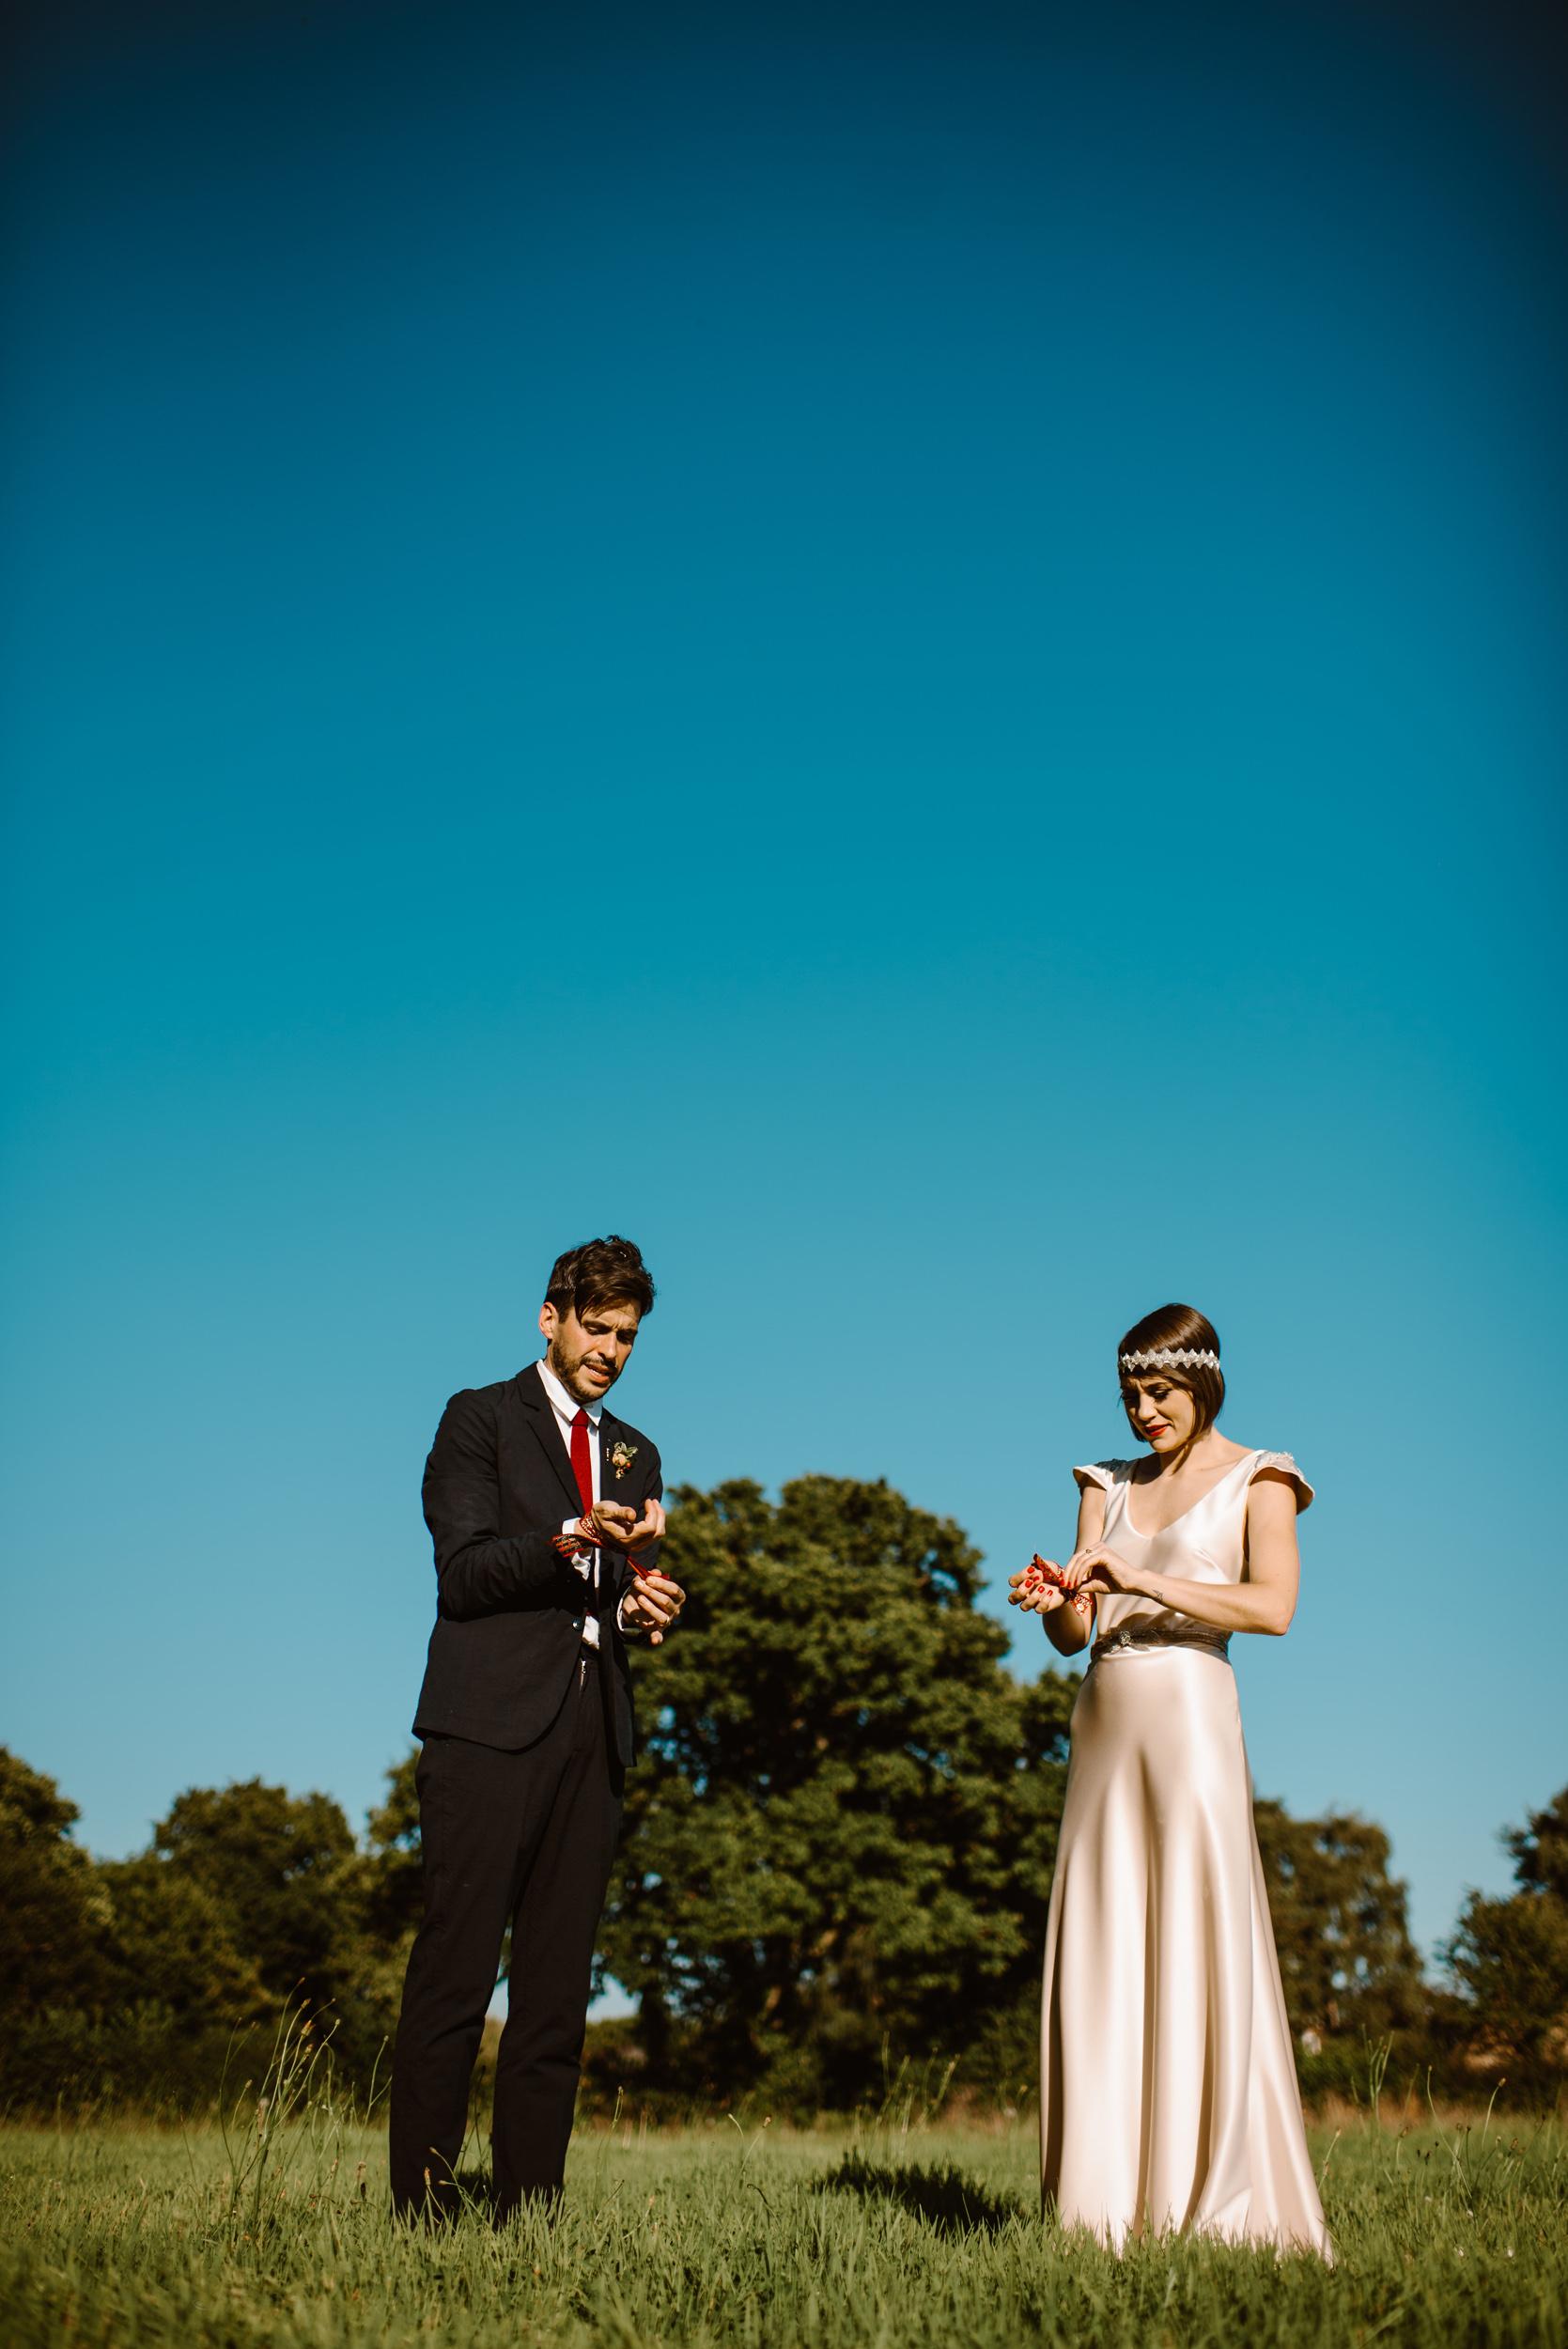 Ro-Kate-Beaumont-bias-cut-silk-wedding-gown-back-garden-wedding-by-Ellie-Gillard-19.jpg